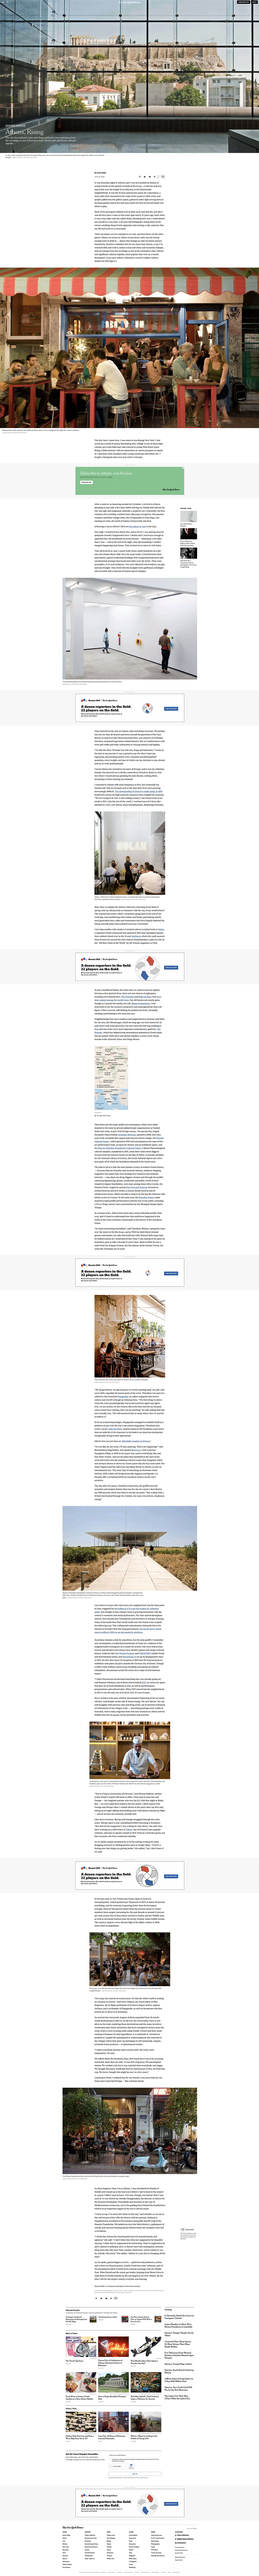 Athens Rising Athens Web Design Cultural Capital